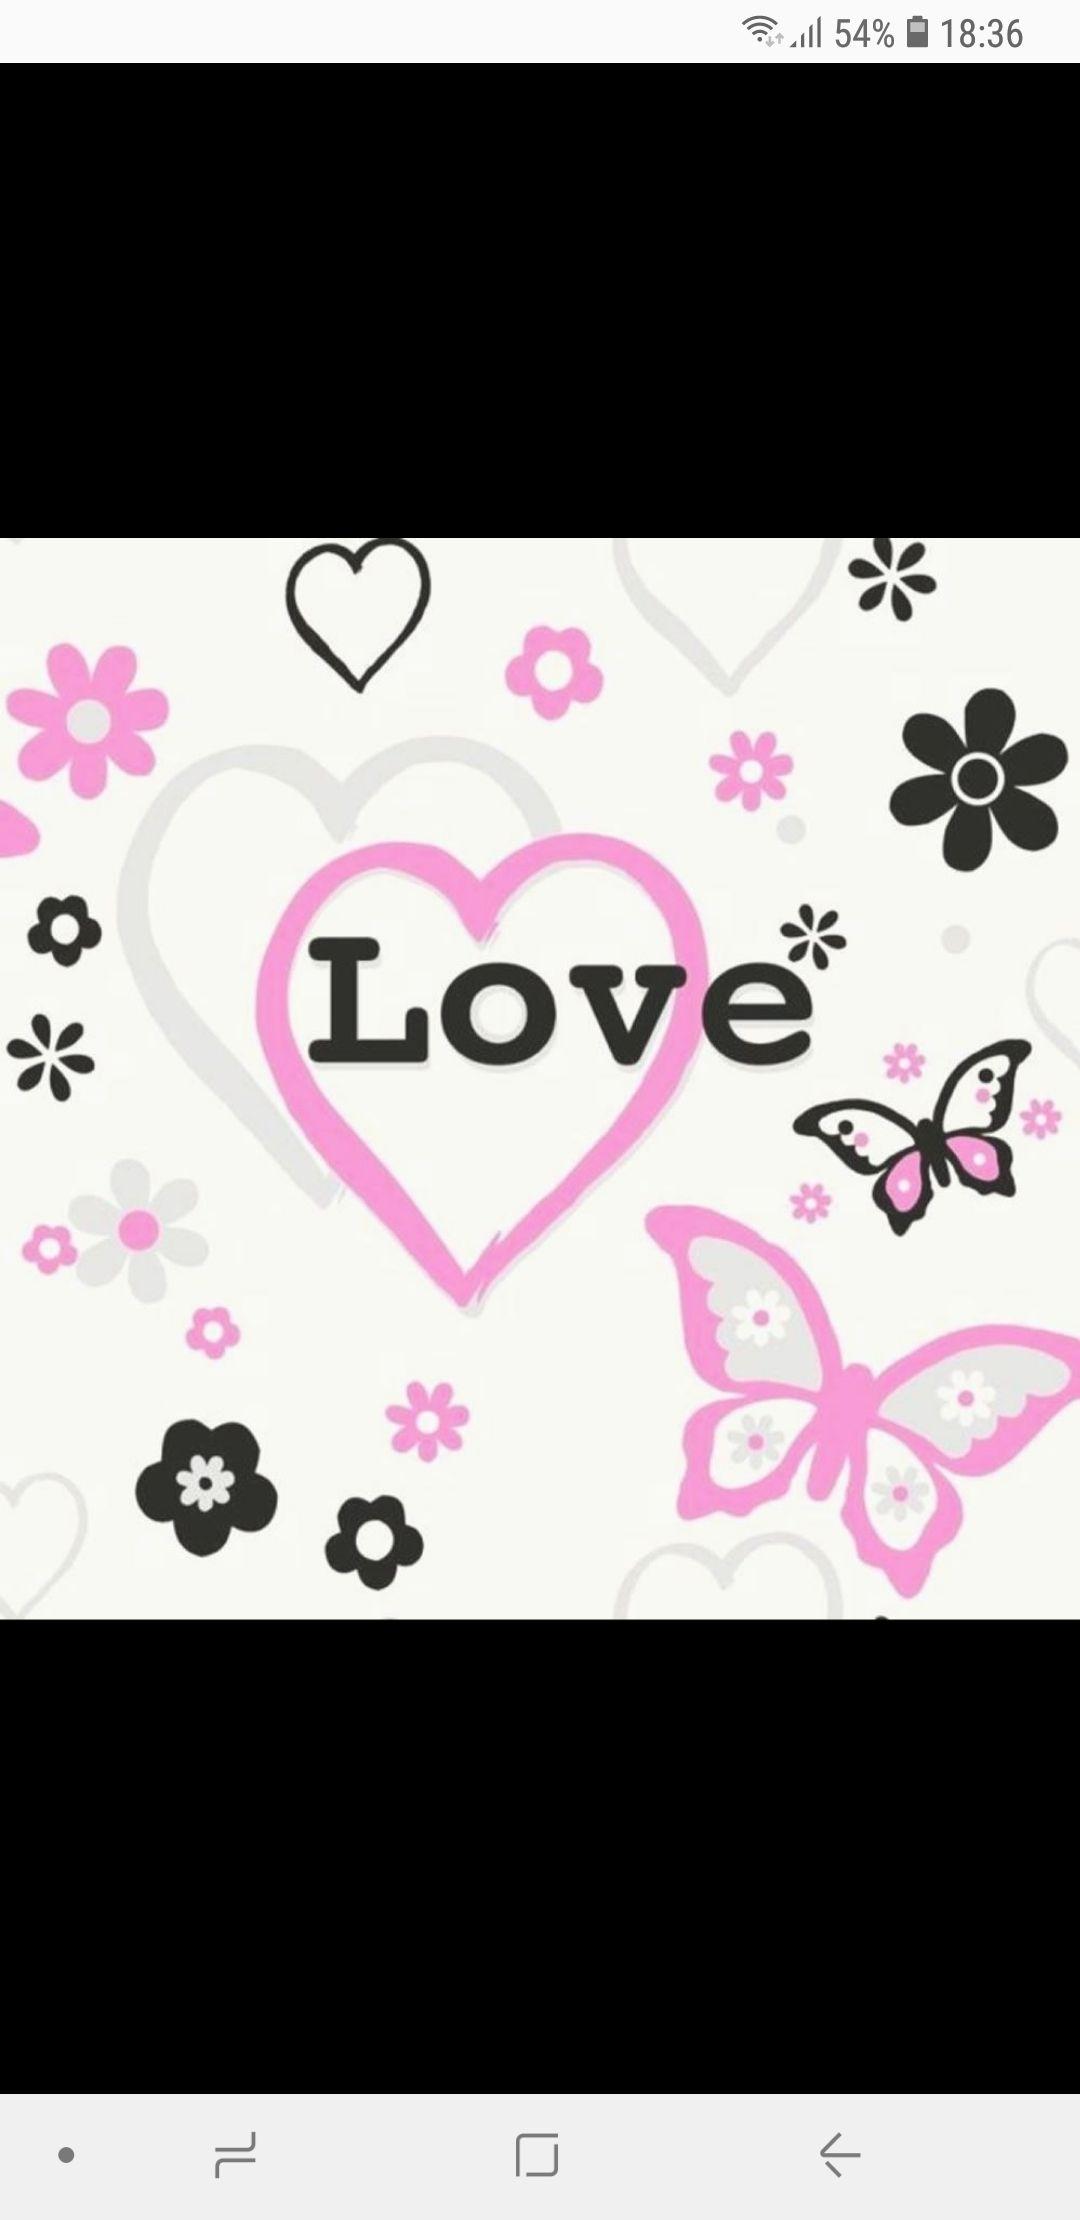 Love Hearts Flowers Butterfly Children Kids Girls Bedroom Pink Wallpaper at I Love Wallpaper for £8.49 delivered